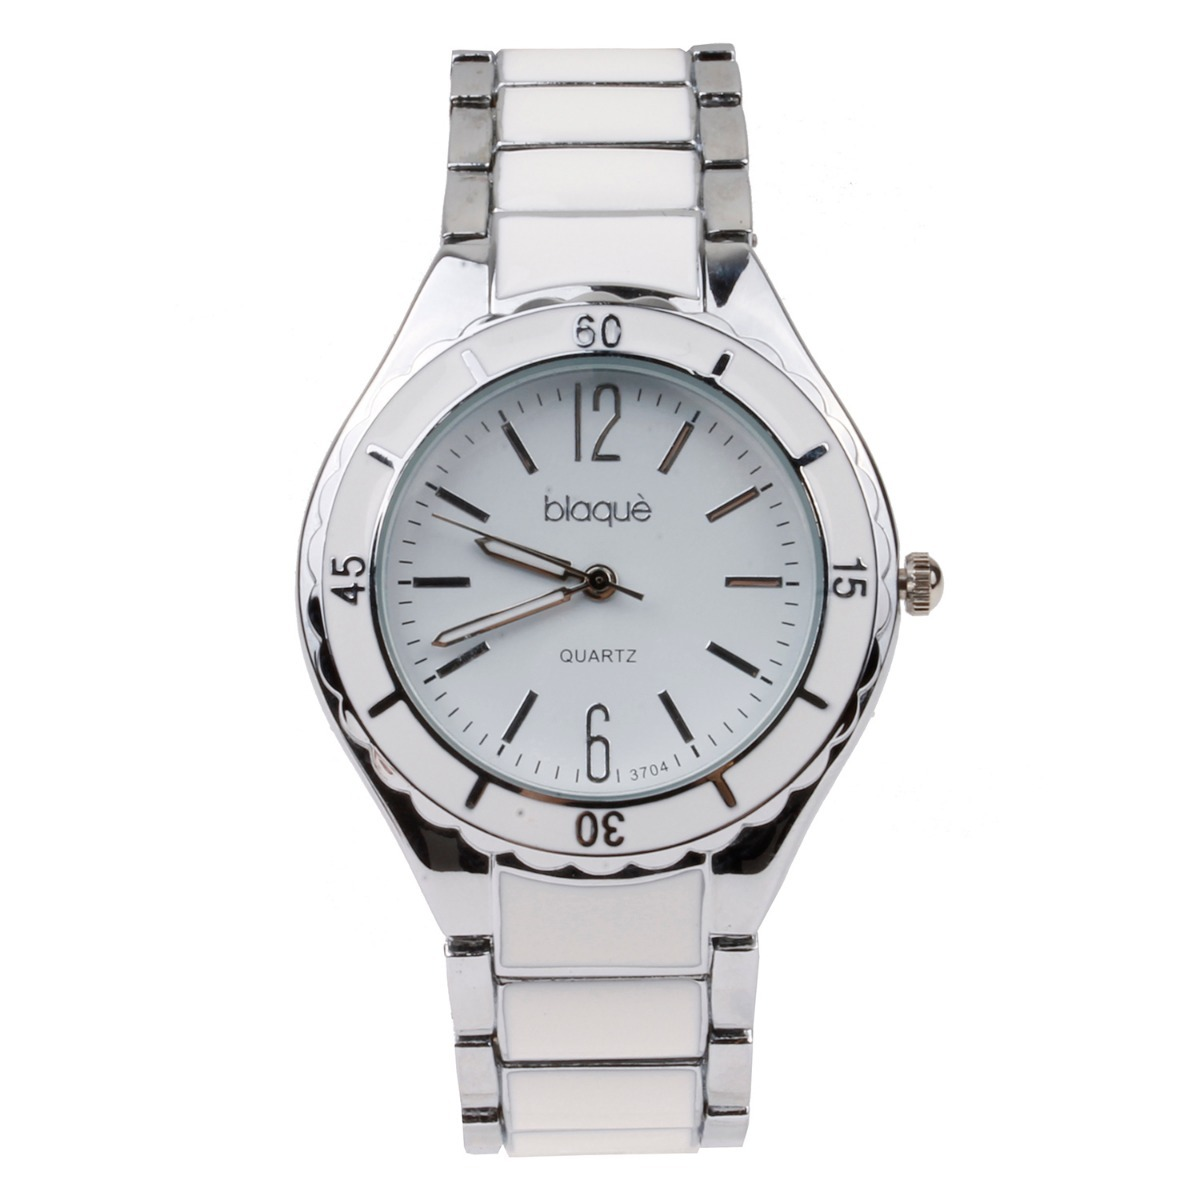 Reloj Blaque Dama Blanco Negro Gold Acrilico Ceramik 156 -   2.275 ... d7d9229d41bf